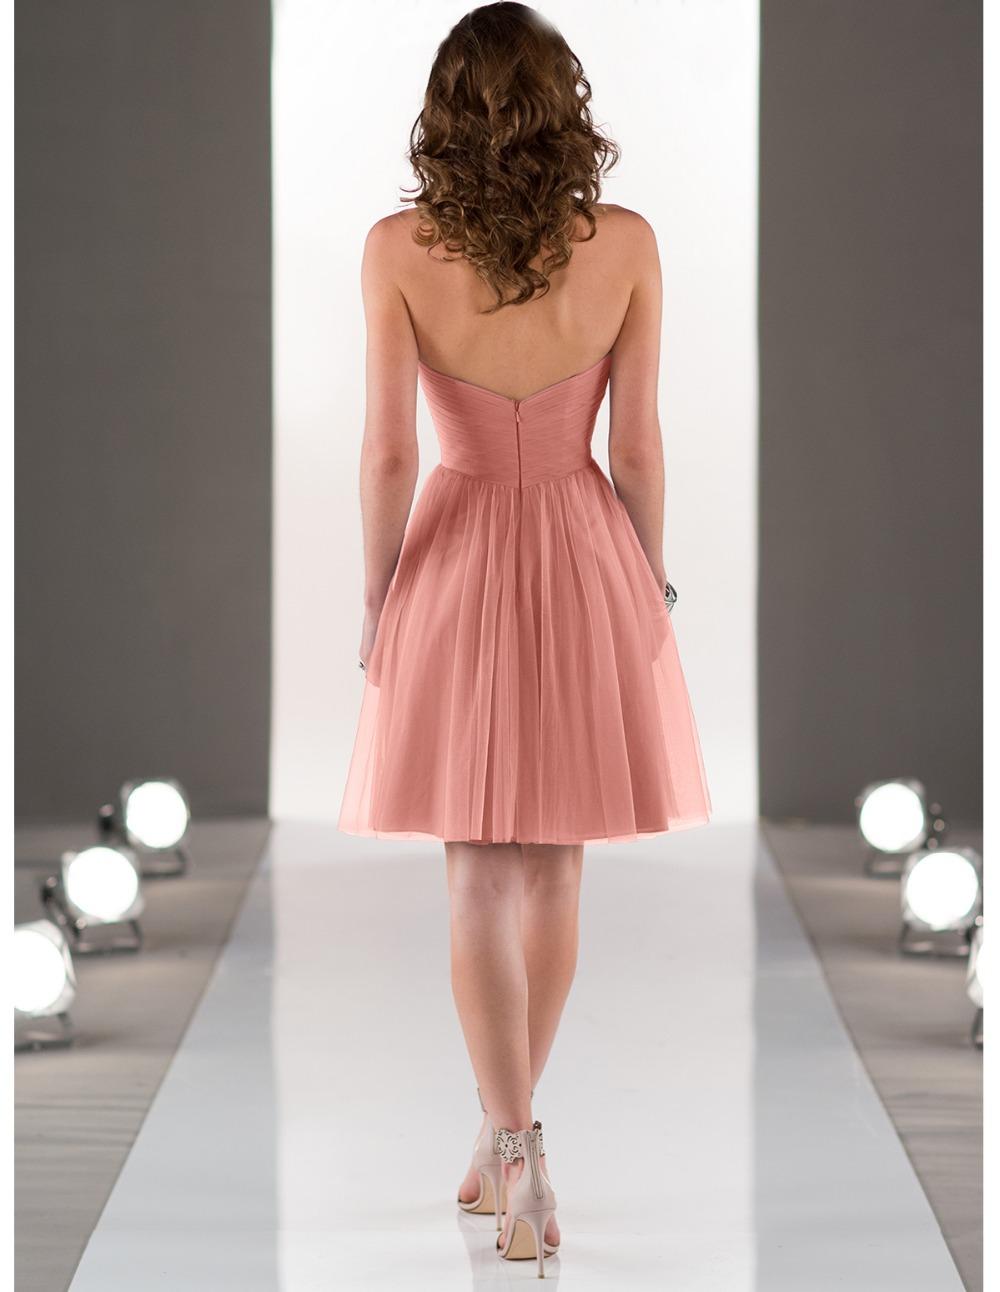 robe demoiselle d honneur cheap coral colored bridesmaid dresses 2015 plus size beach wedding party dress